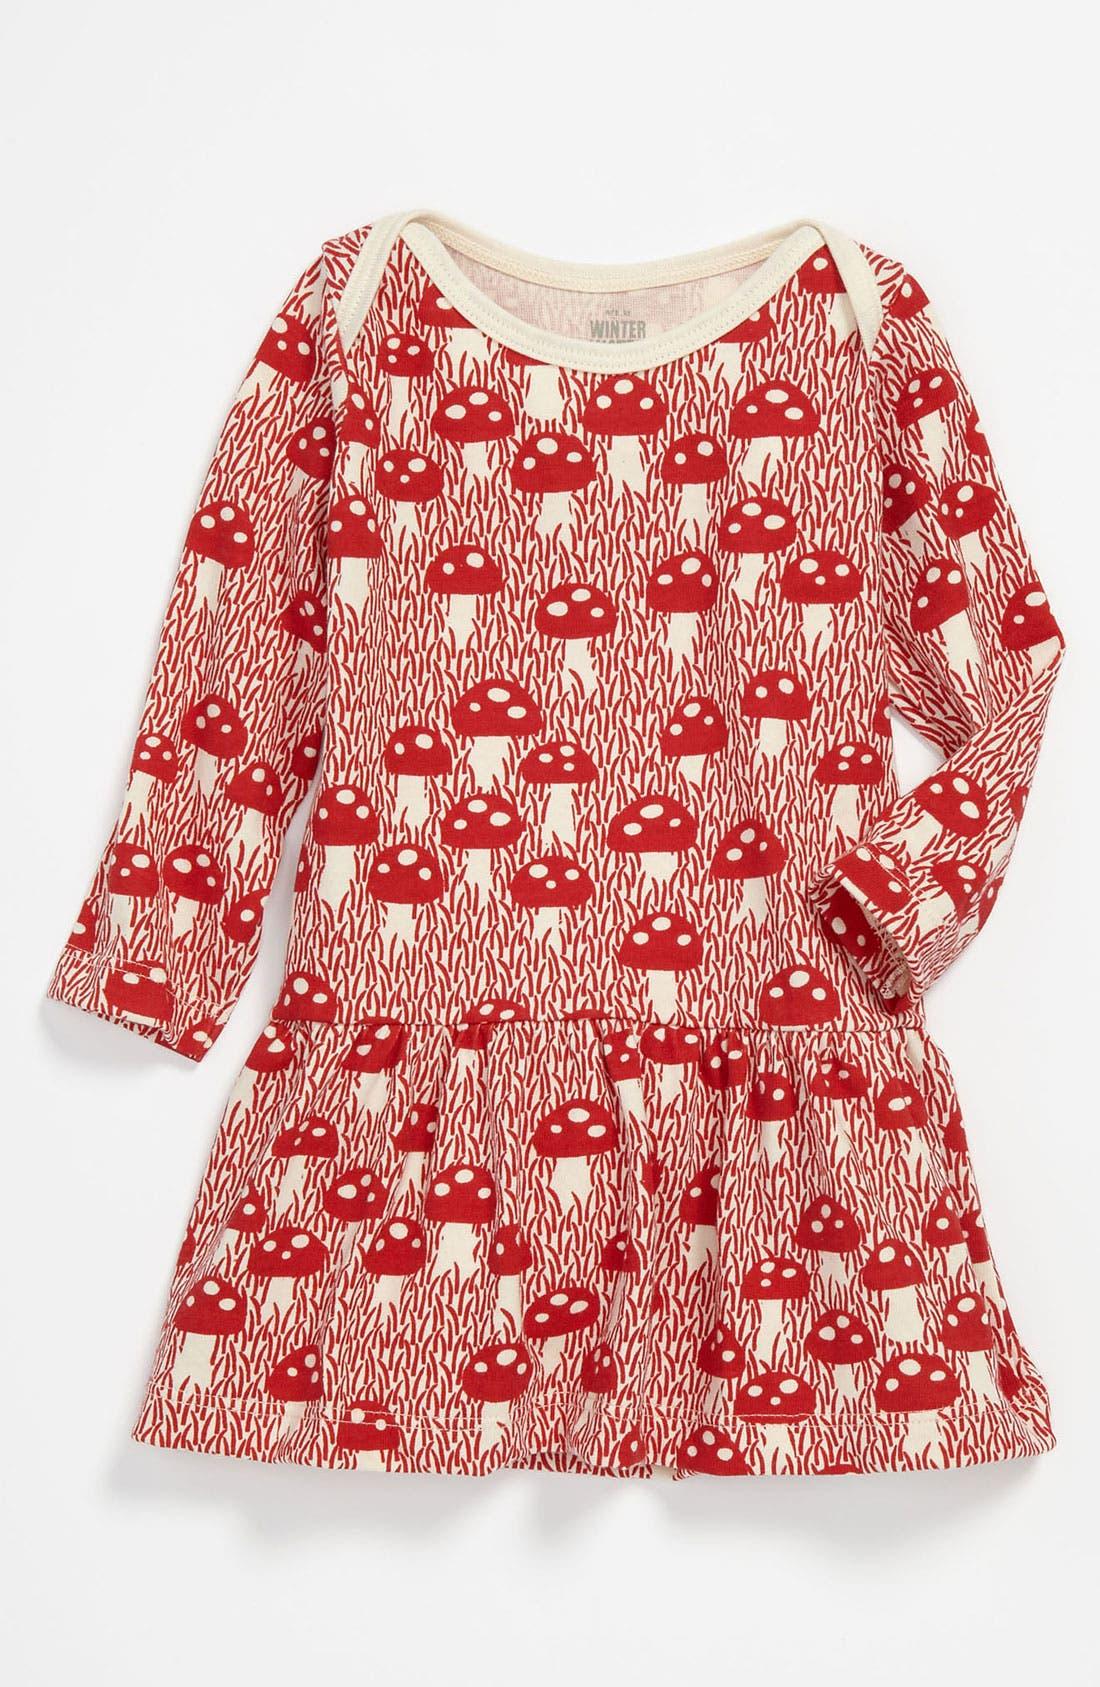 Main Image - Winter Water Factory 'Luna' Dress (Infant)